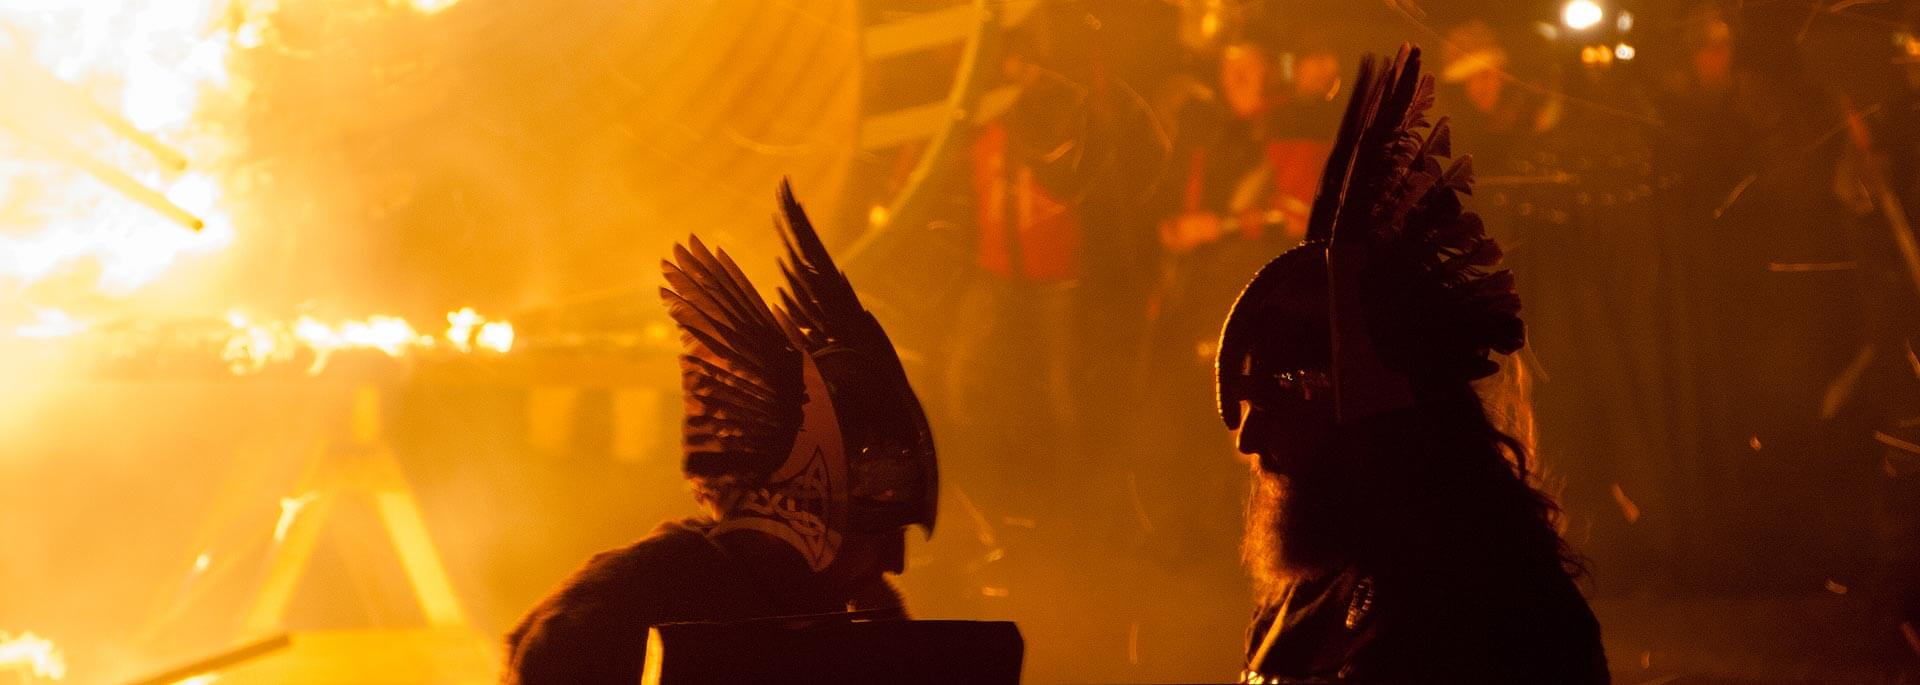 Reisetipp: Up Helly Aa - Europas größtes Feuer-Festival in Lerwick